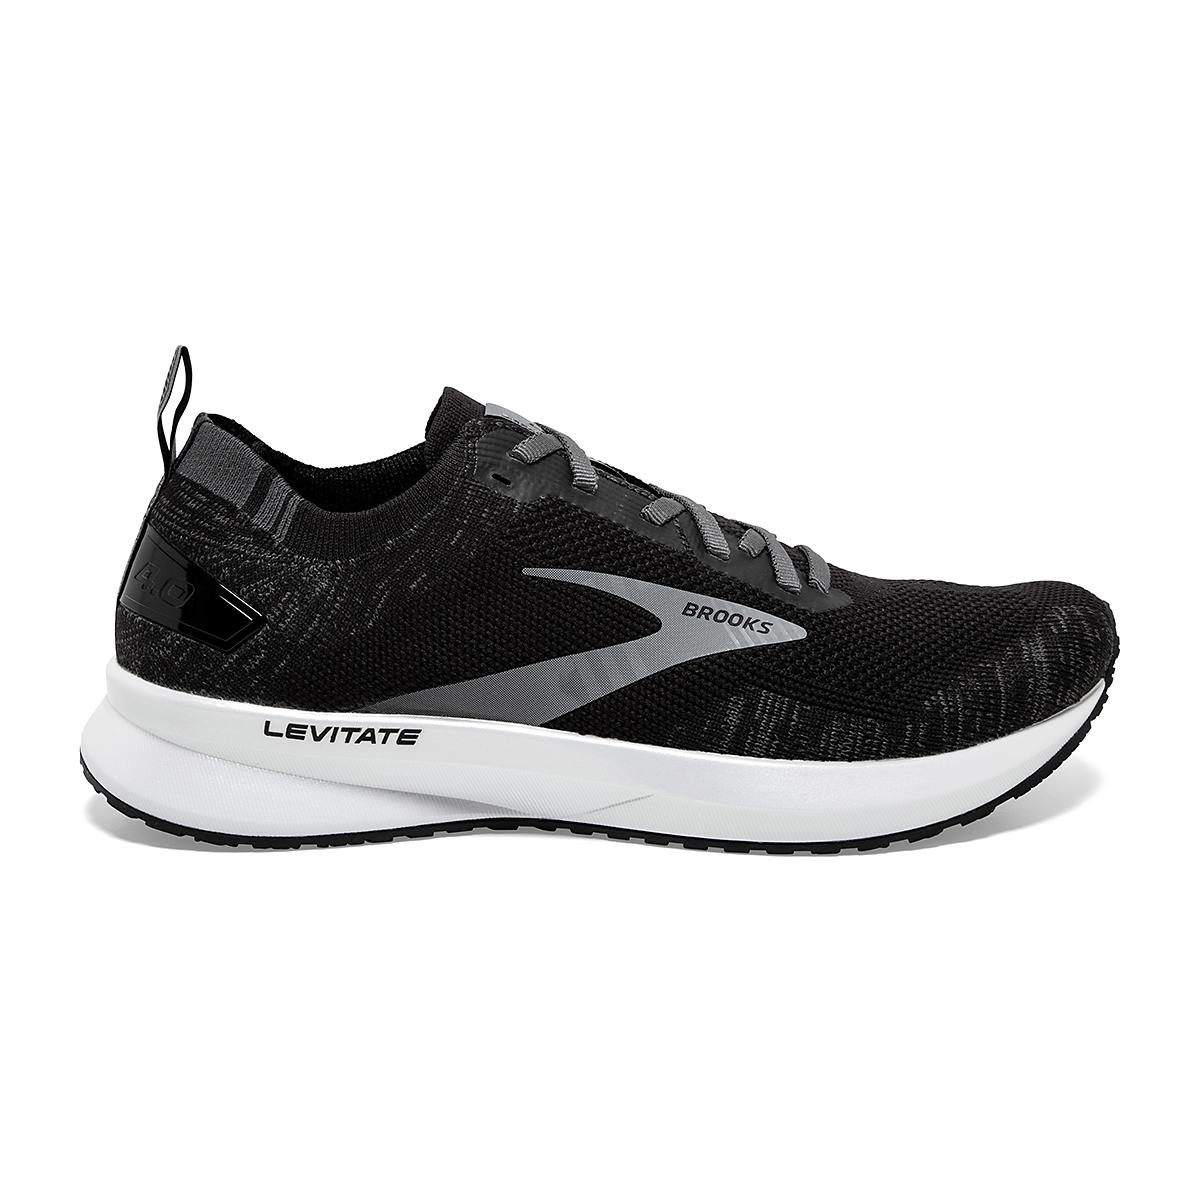 Women's Brooks Levitate 4 Running Shoe - Color: Black/Blackened Pearl/White - Size: 5.5 - Width: Regular, Black/Blackened Pearl/White, large, image 1